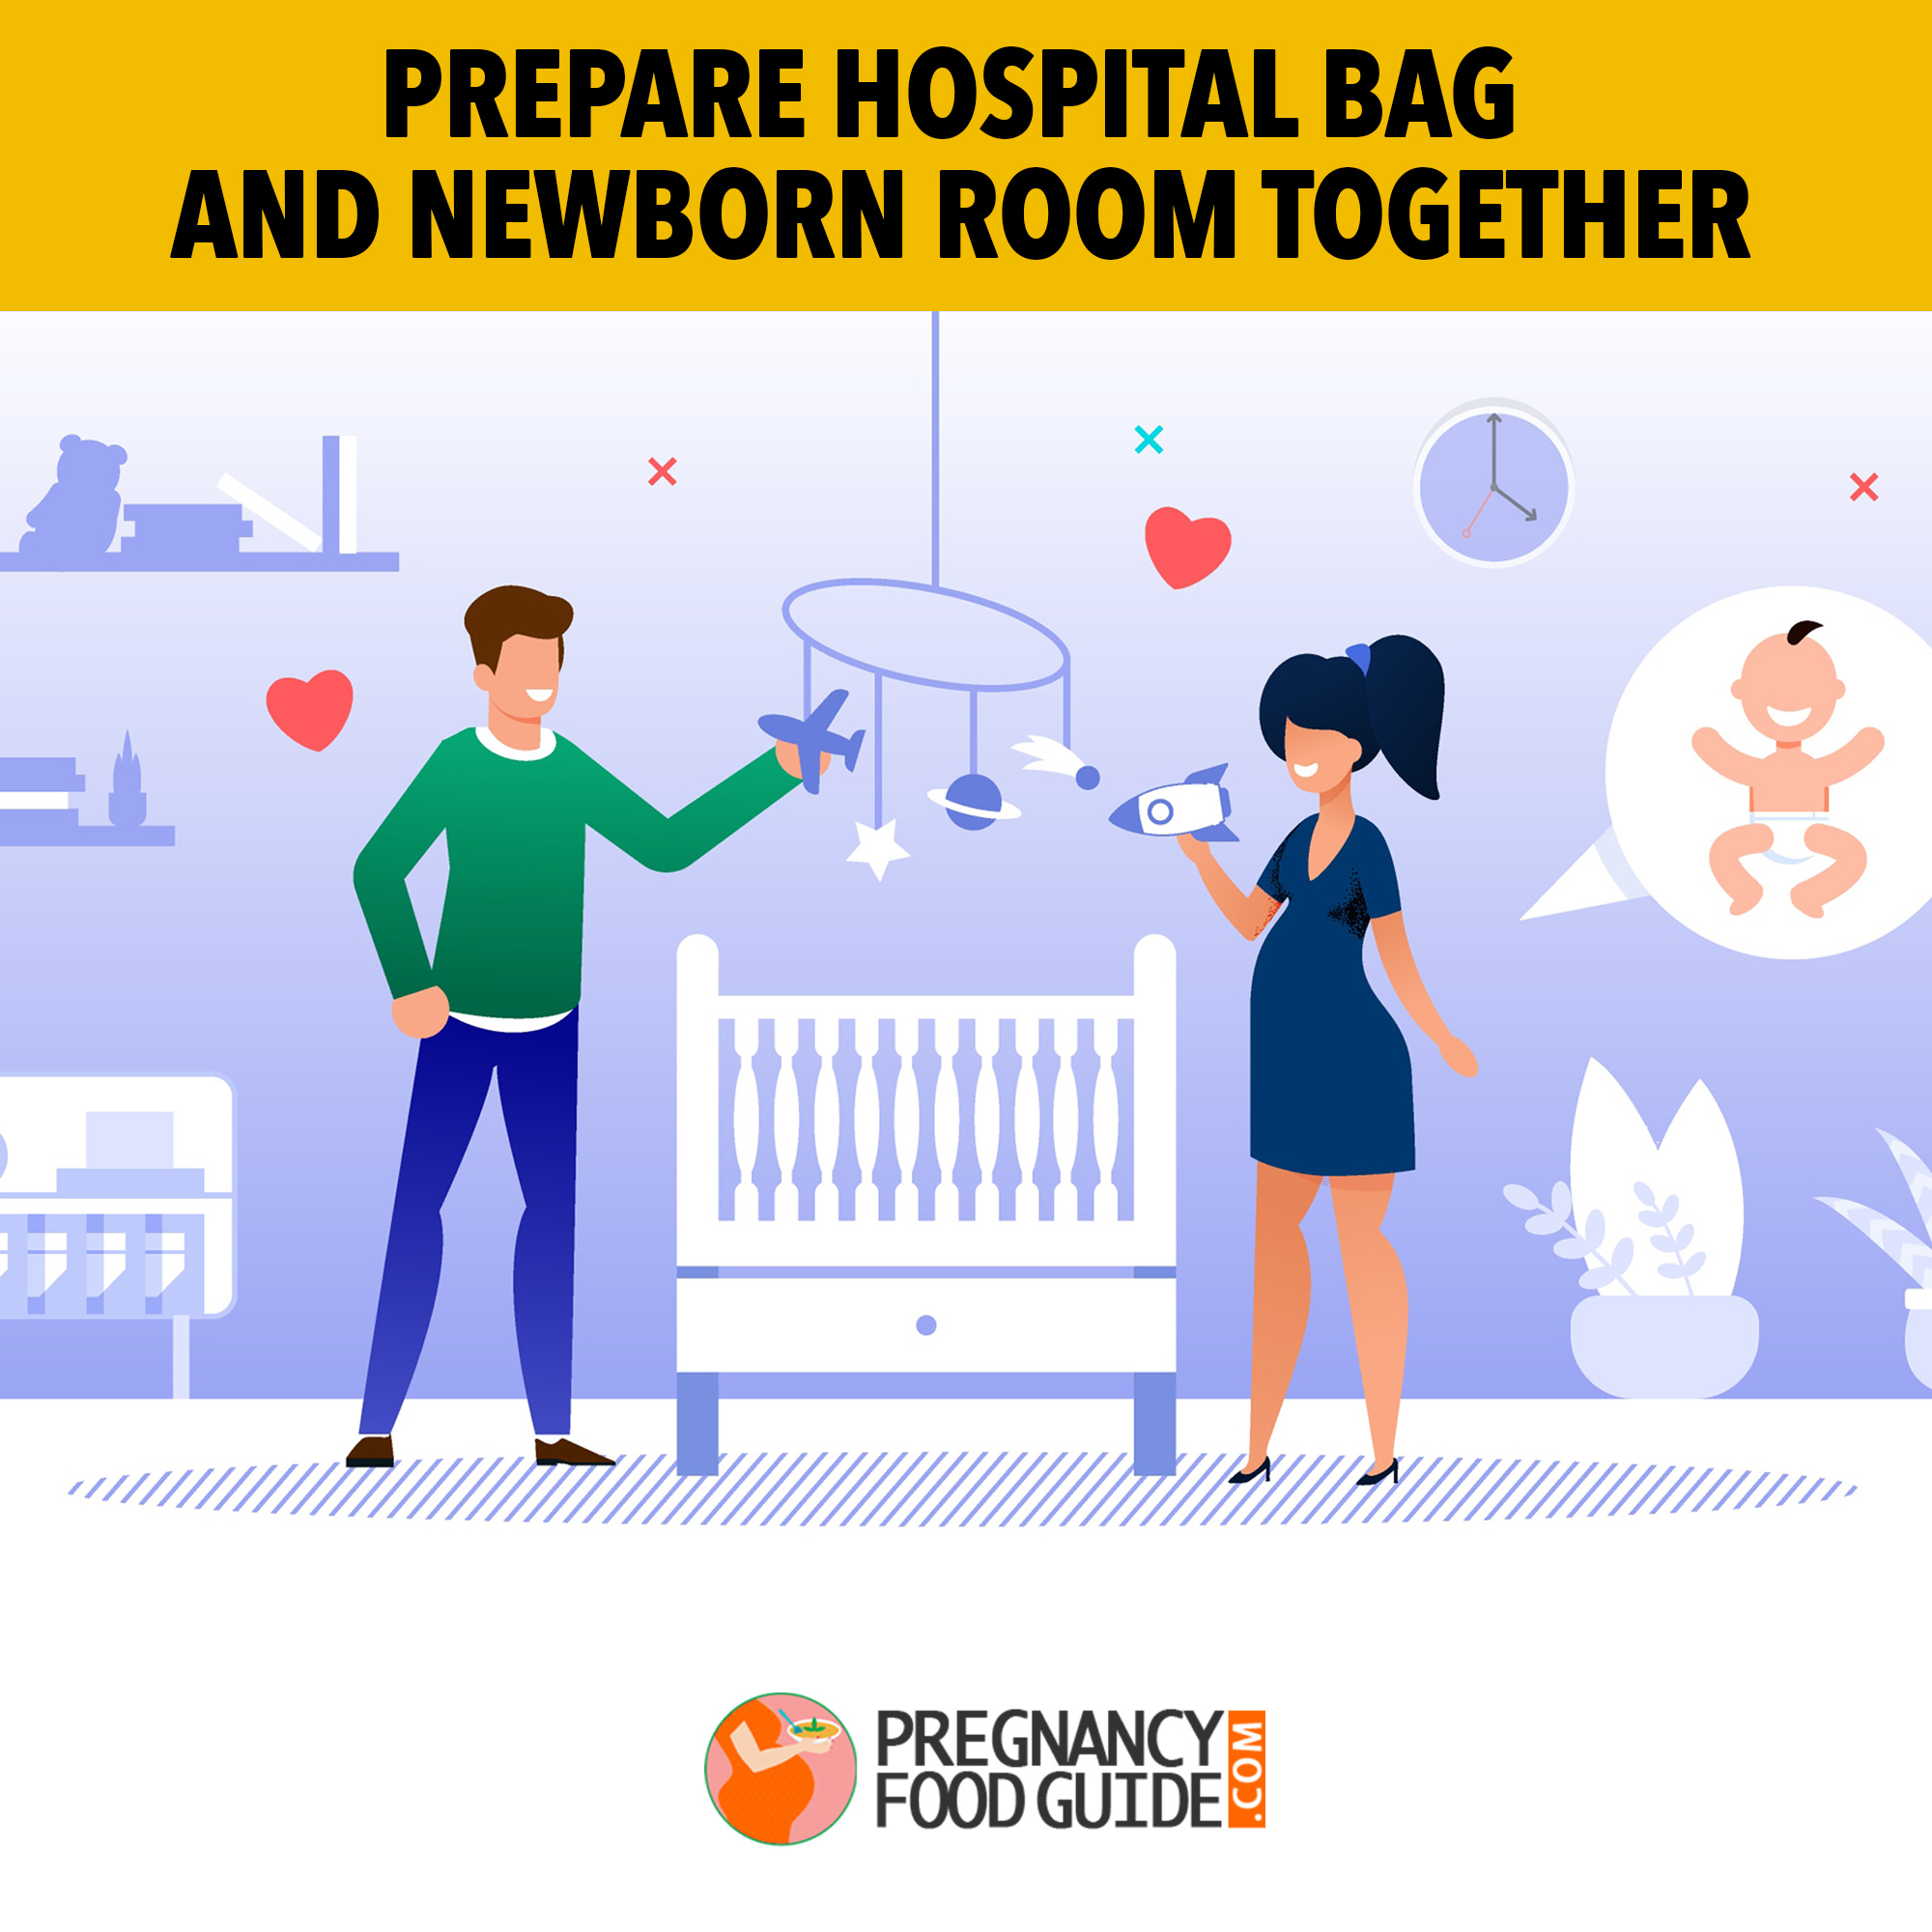 prepare hospital bag